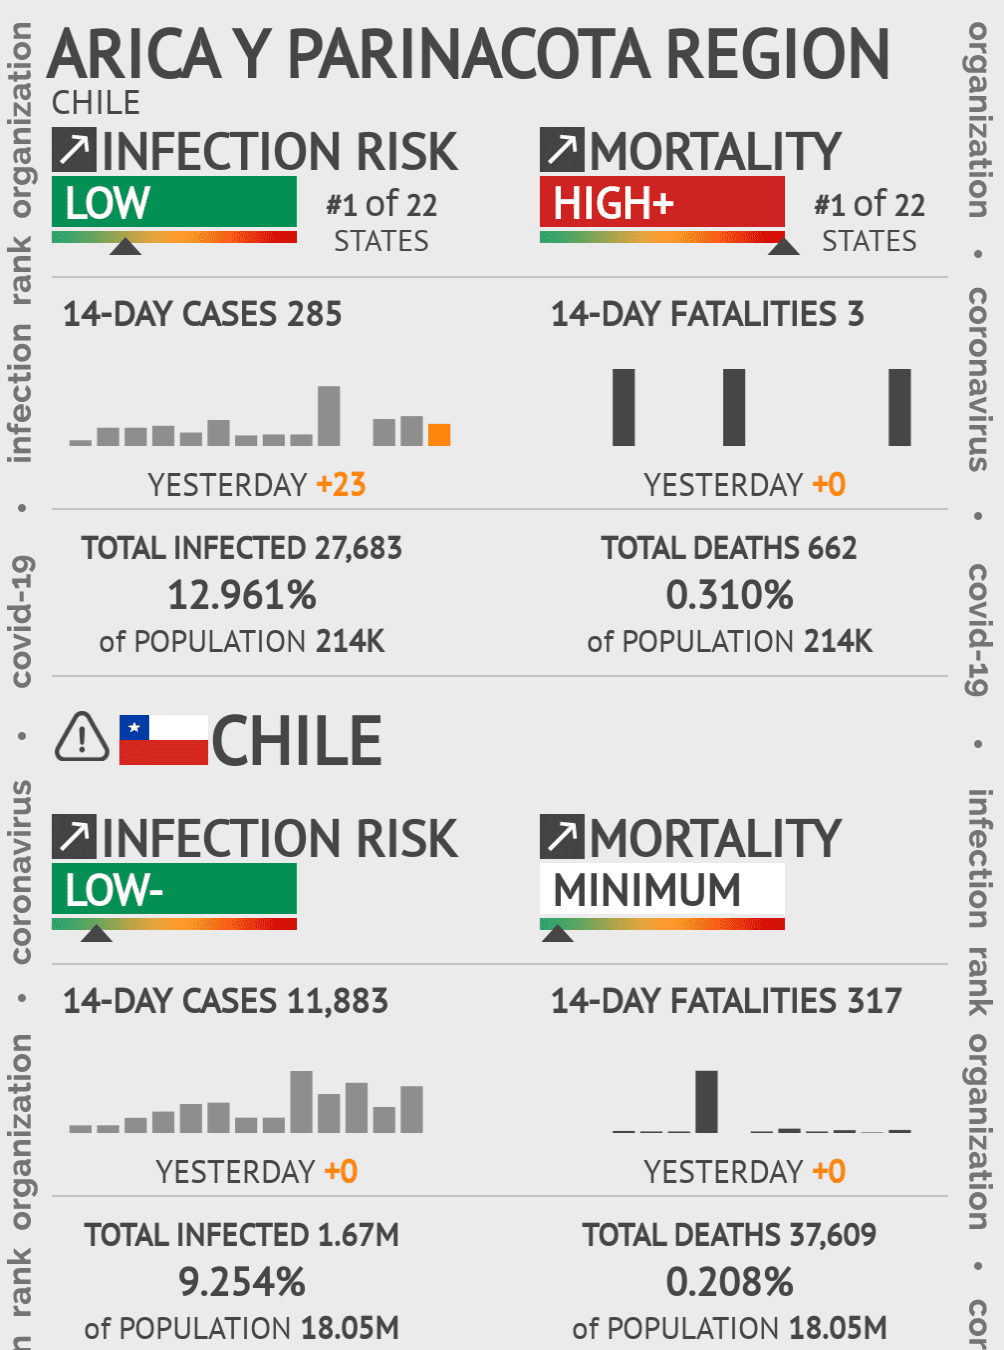 Arica y Parinacota Coronavirus Covid-19 Risk of Infection on March 02, 2021